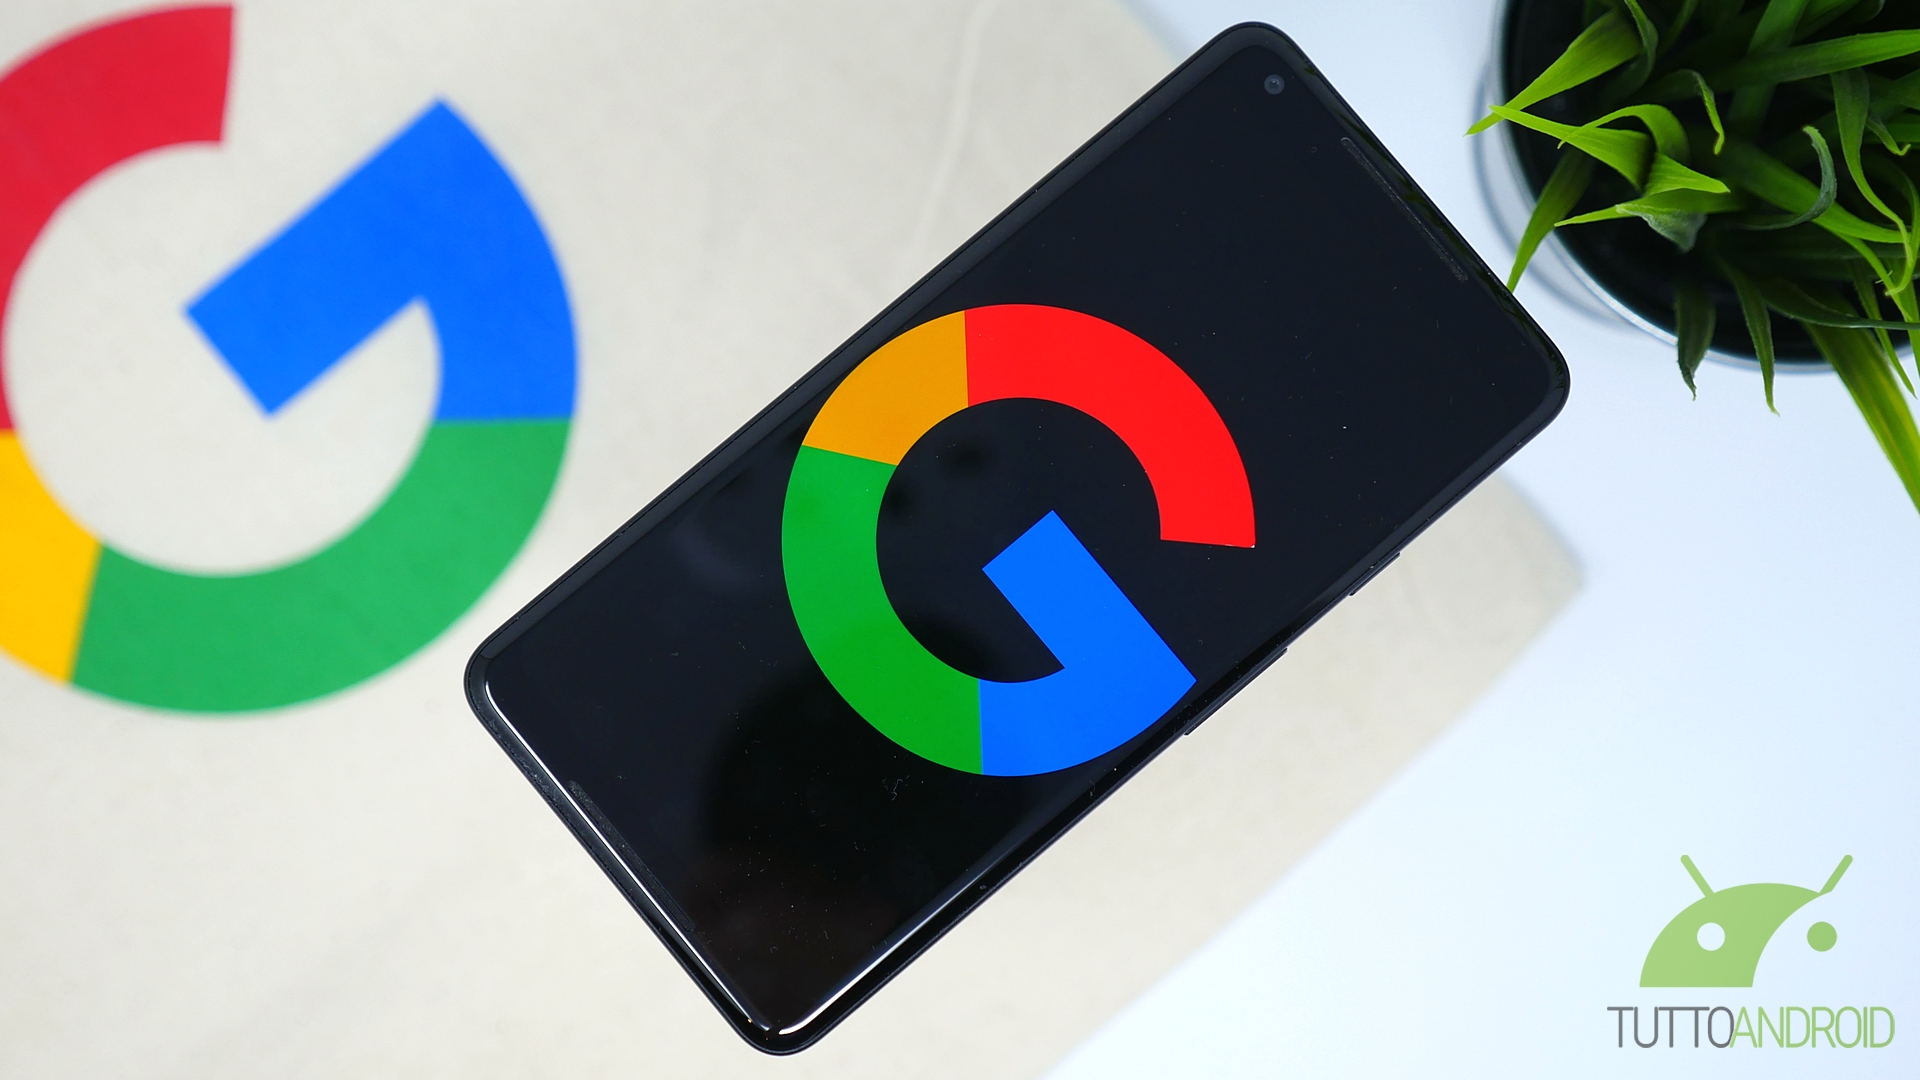 Le ultime novità di Google Chrome, Gboard e Ricerca